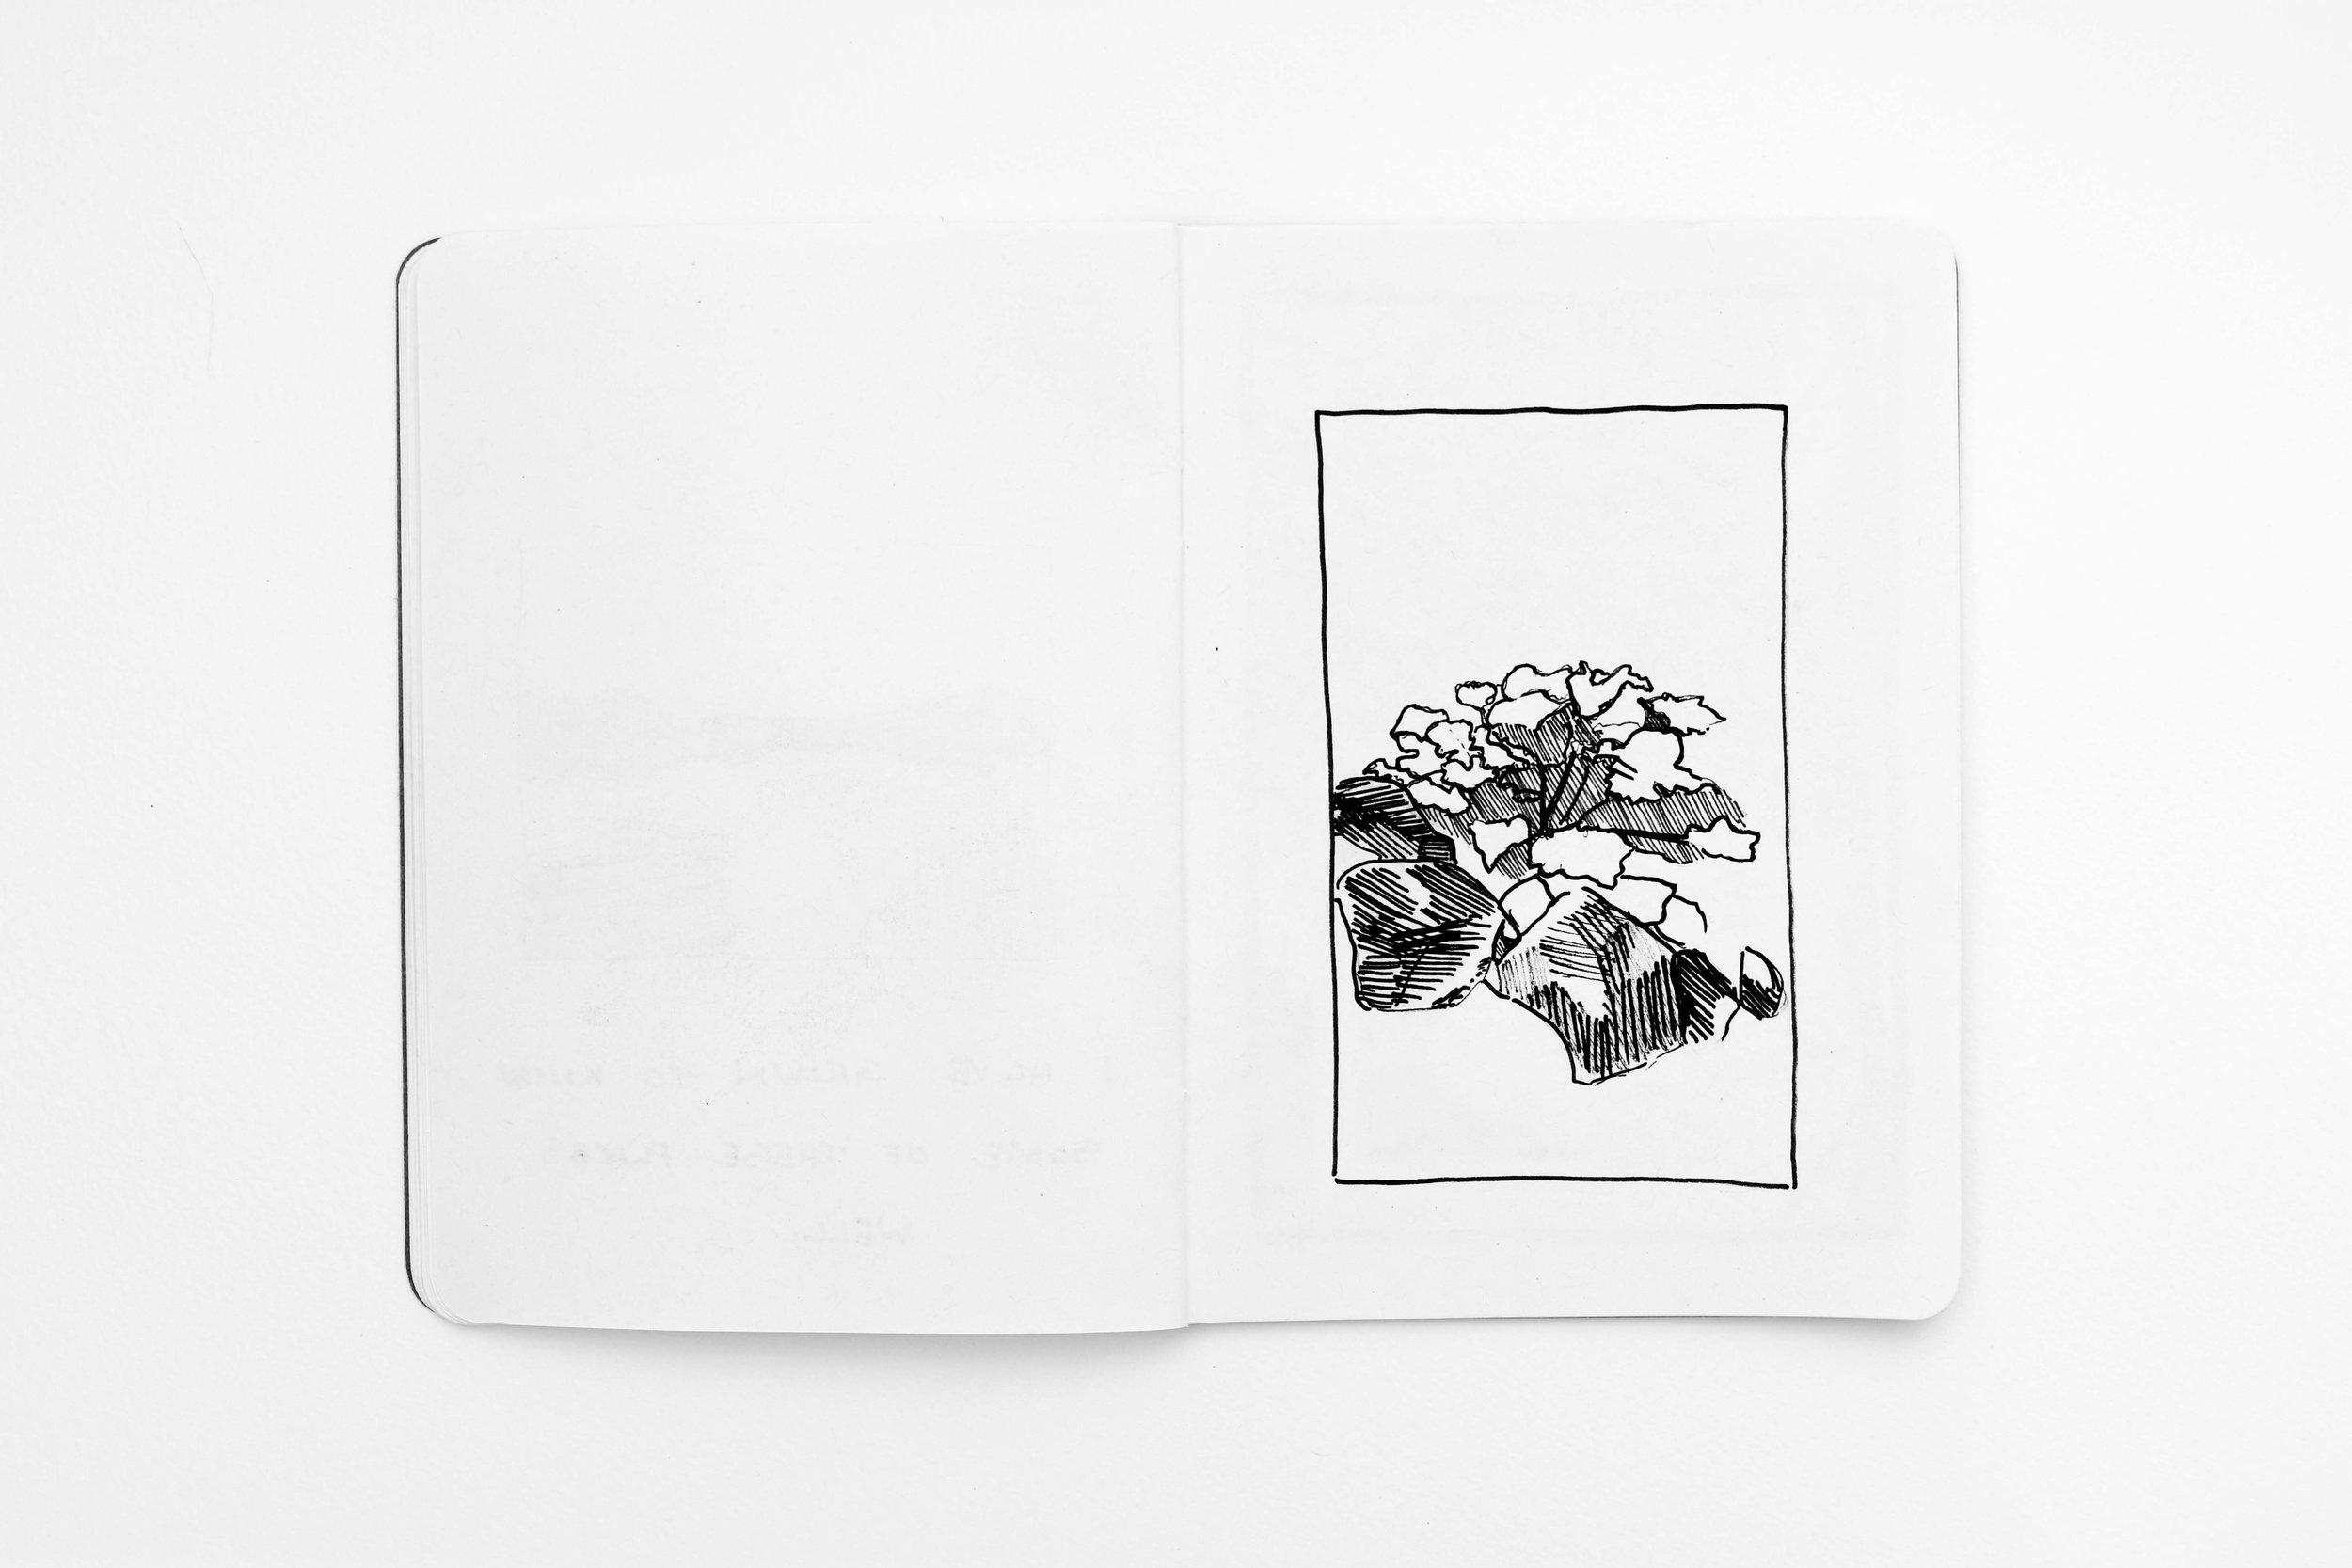 tiffany-moore-sketchbook-landscape (10 of 13).jpg